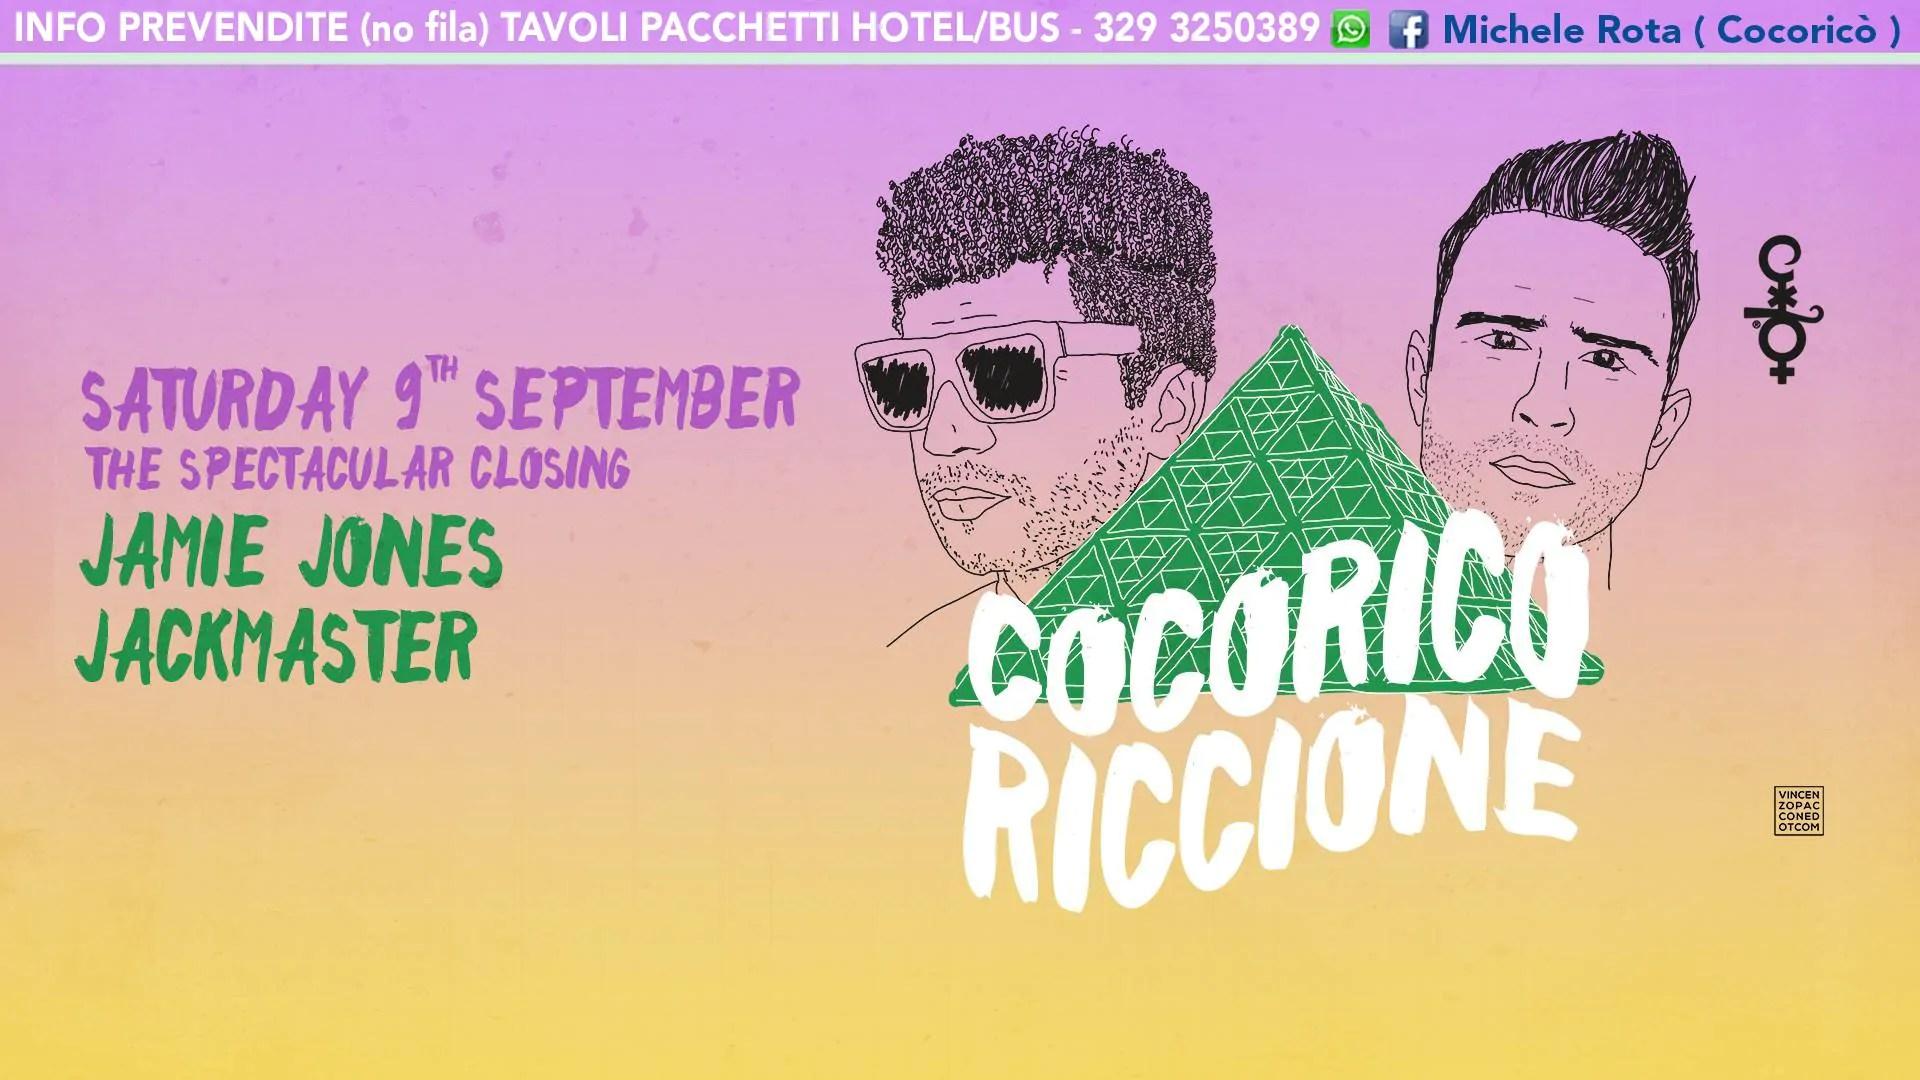 Jamie Jones Jackmaster Cocorico Riccione 09 07 2017